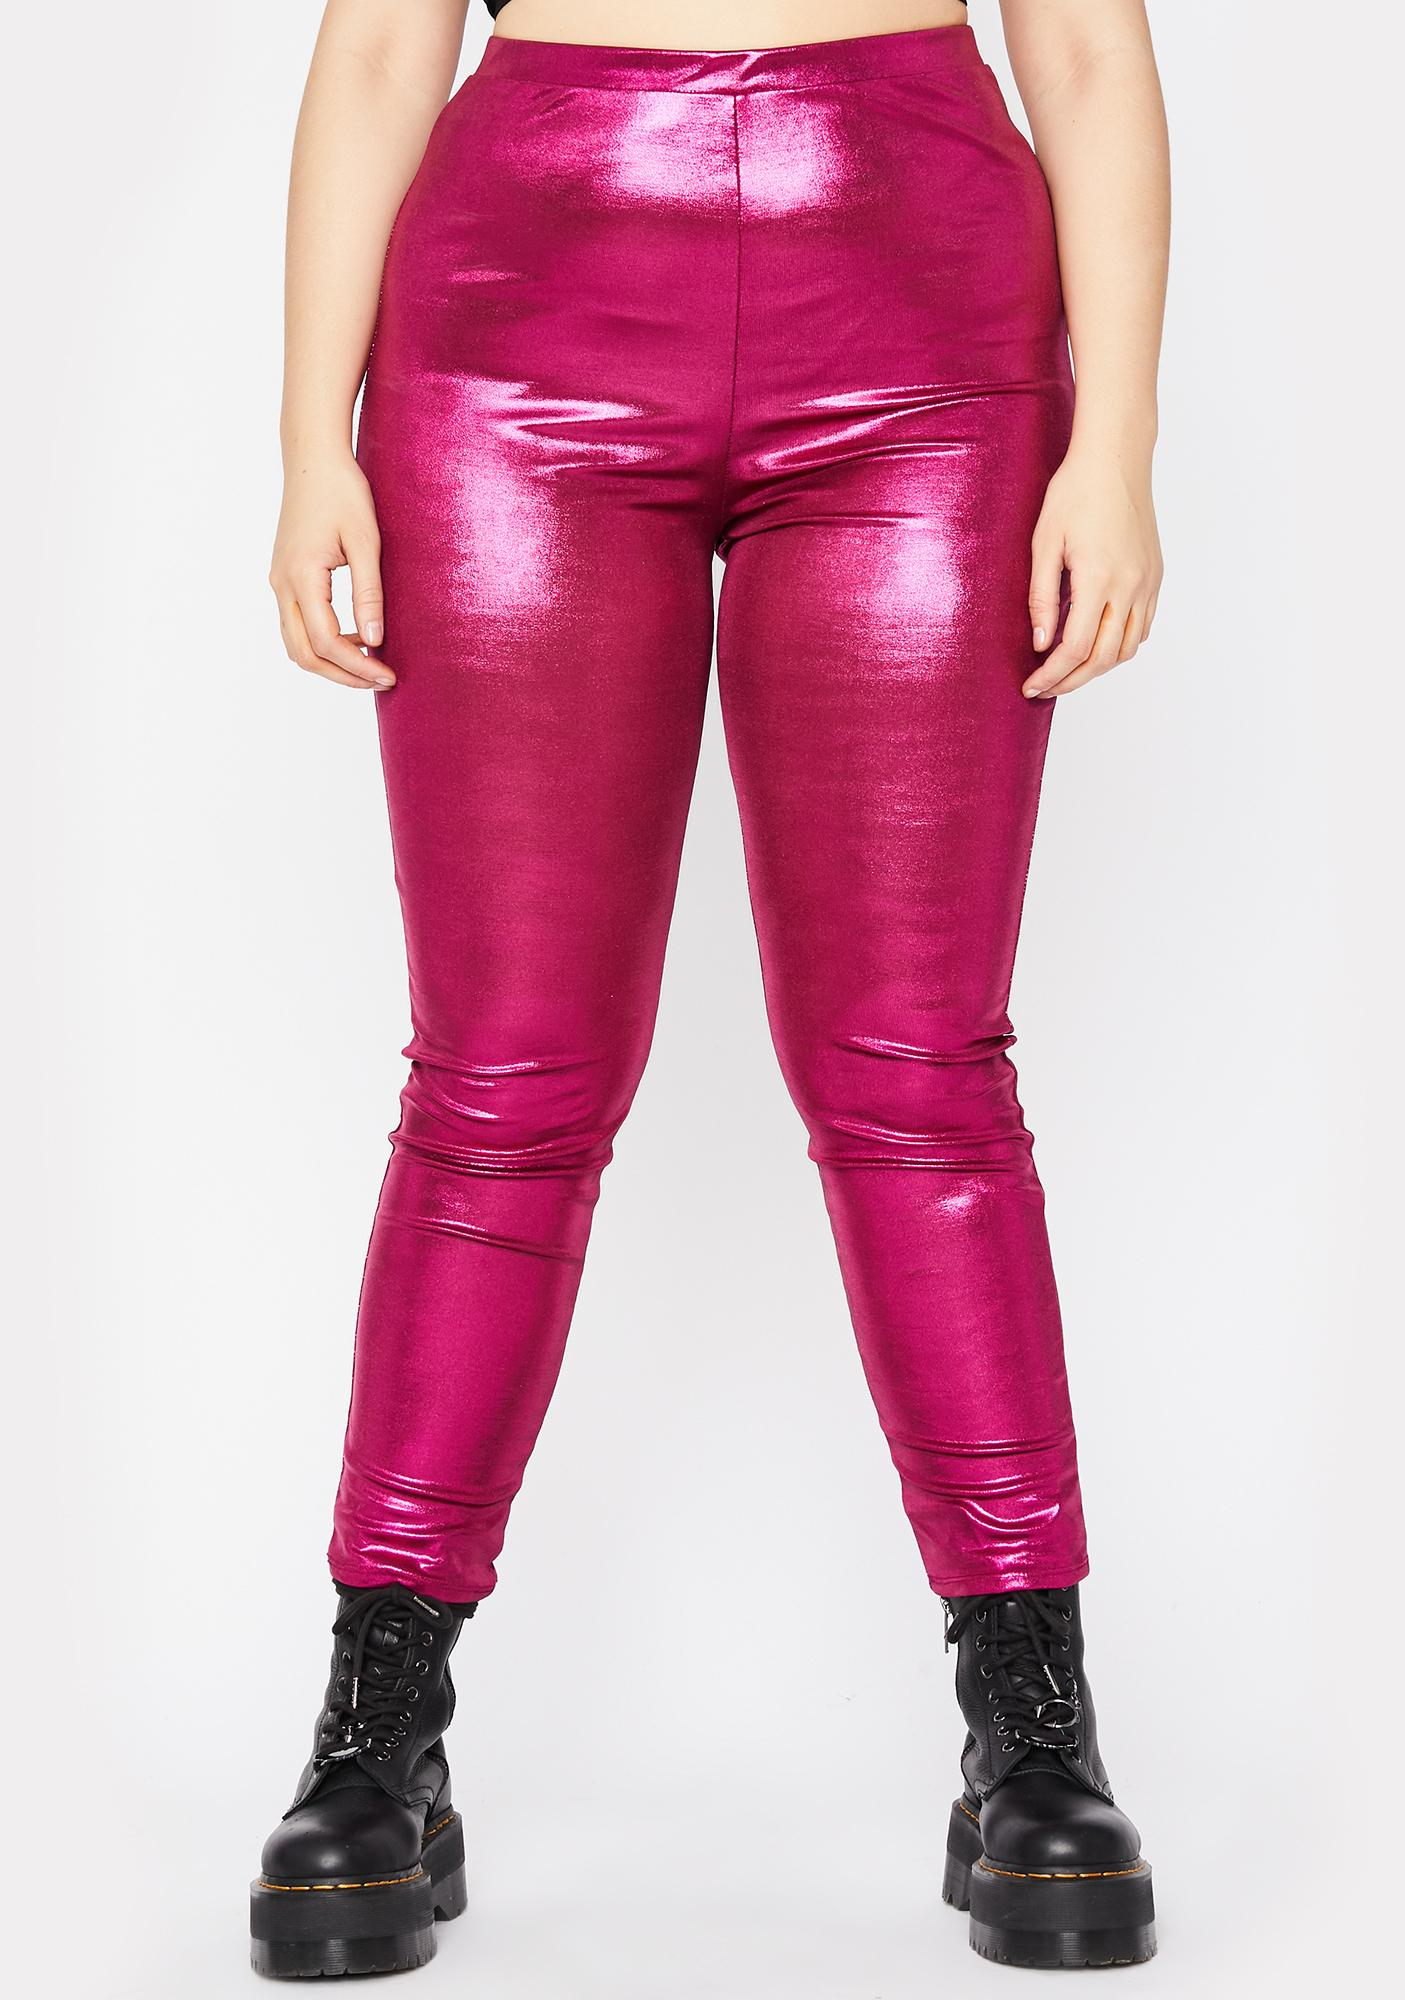 Her Disco Dimension Metallic Leggings